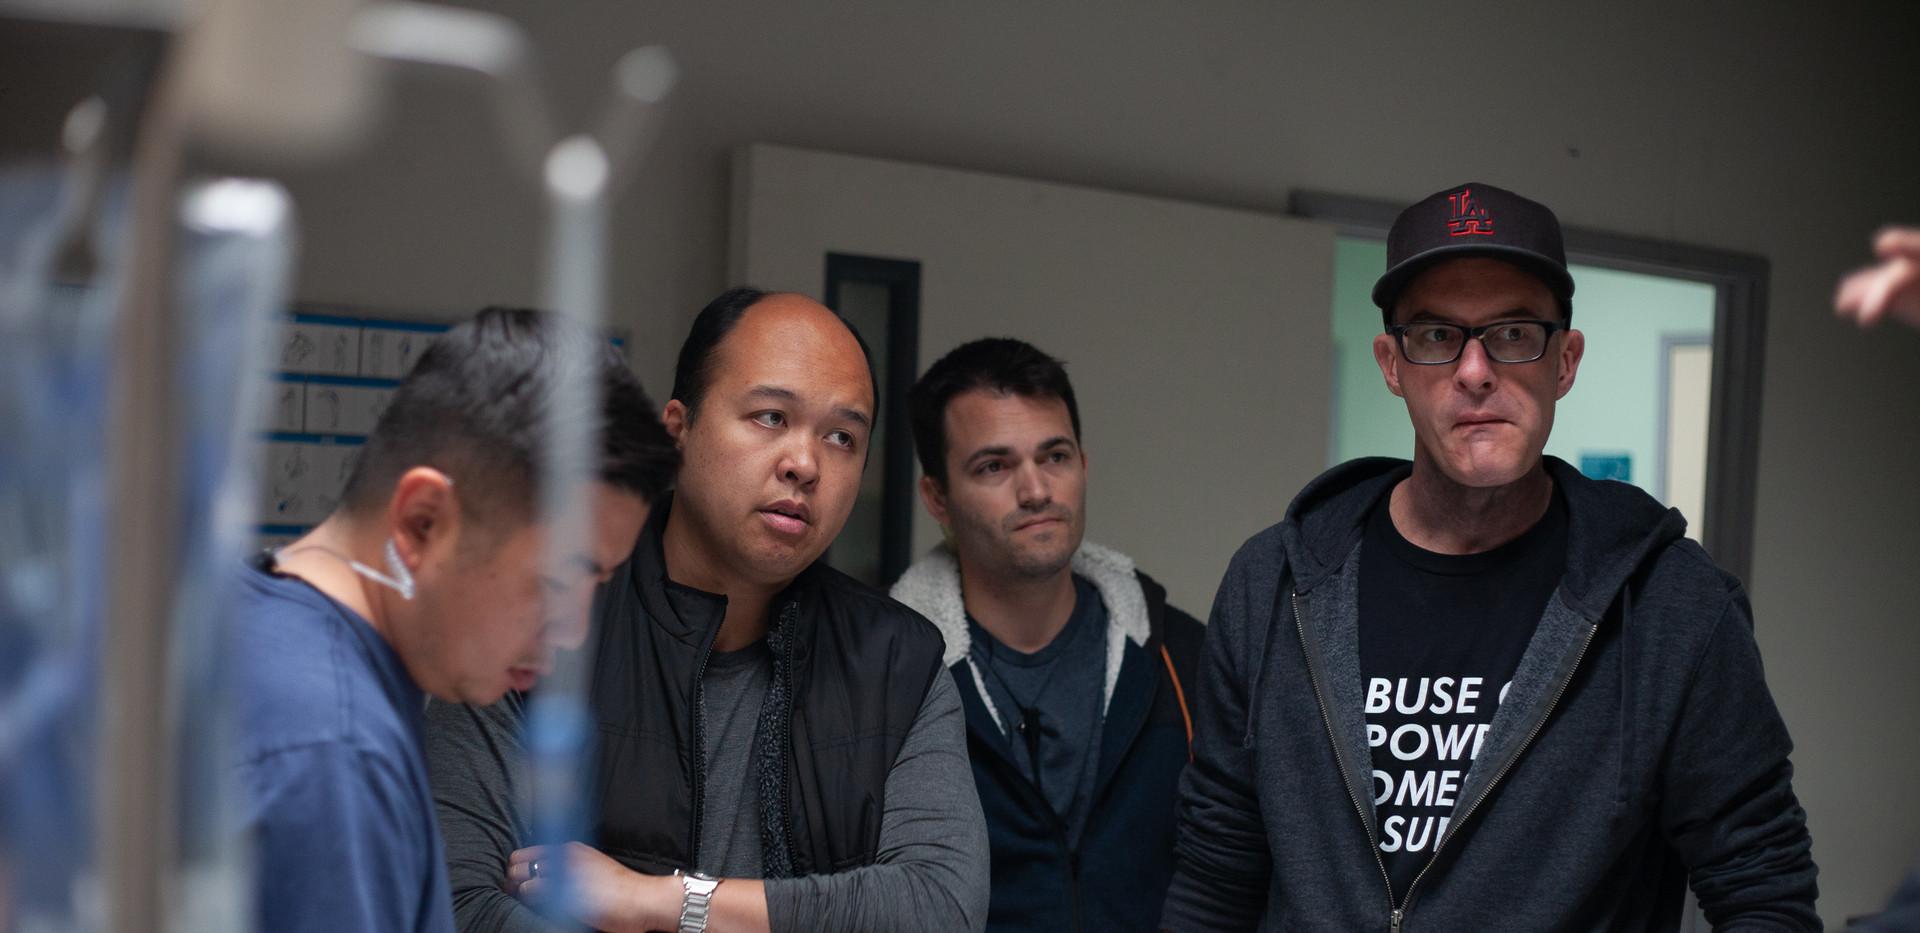 'Code' Official Pre-Production Photos